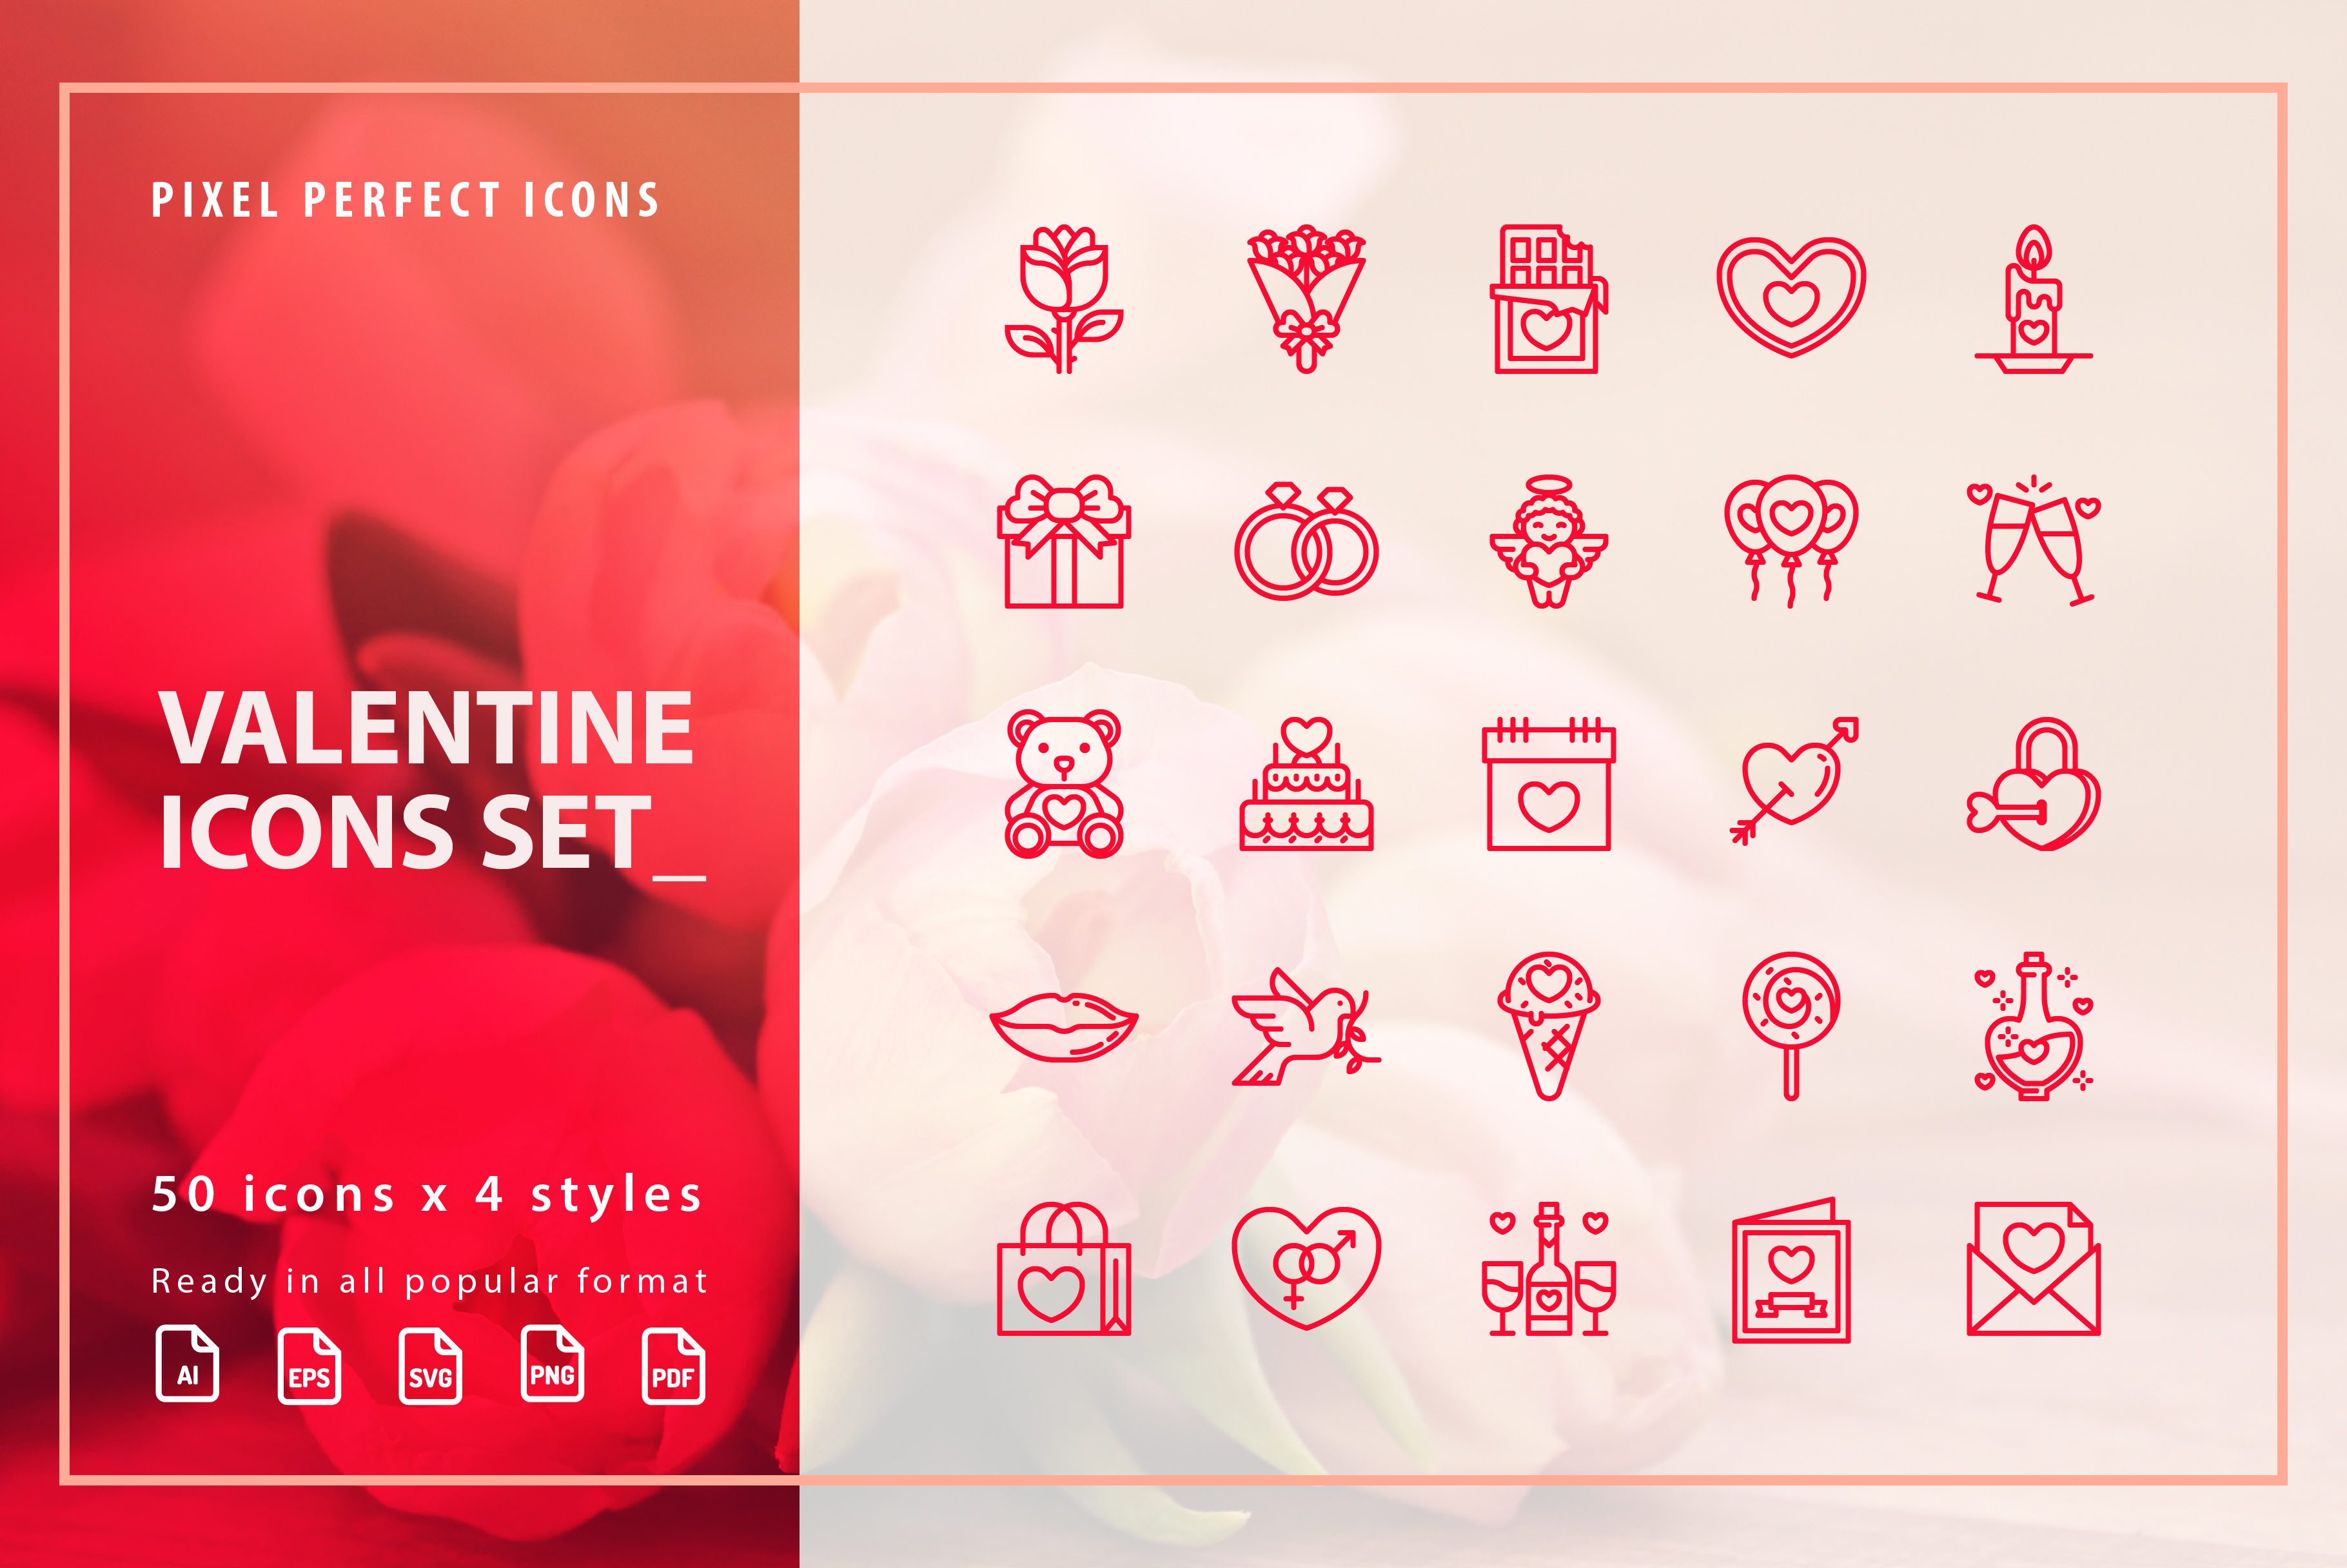 Free Download: Valentine's Day Icon Set